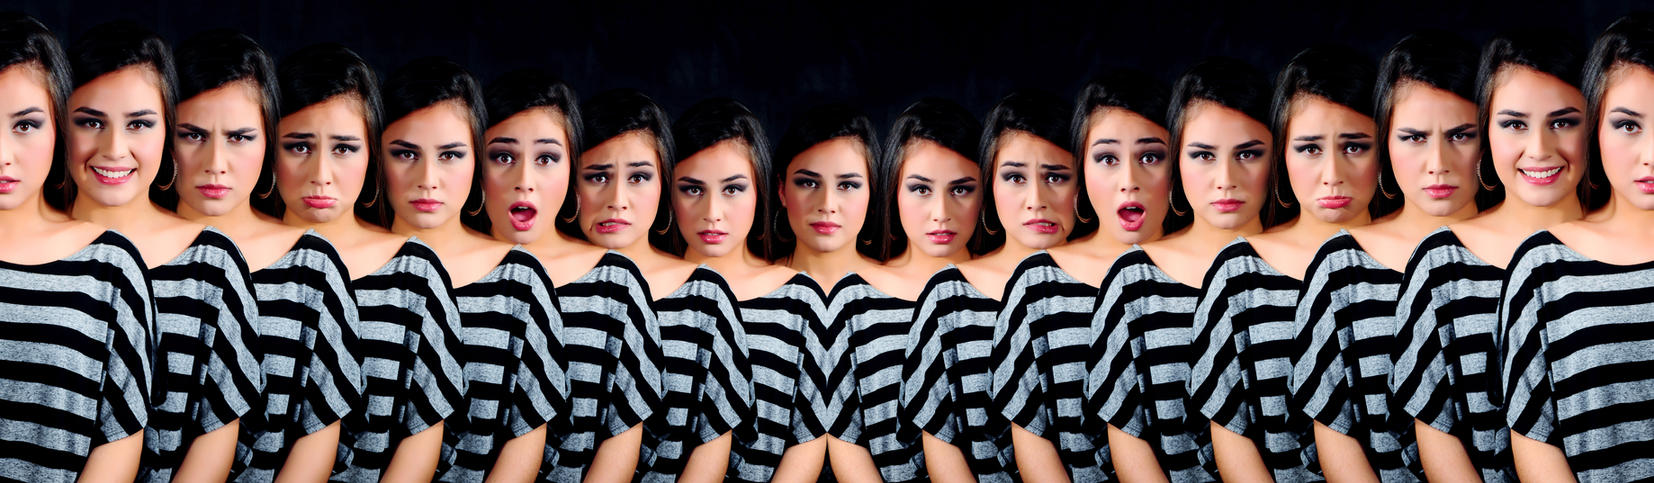 Human Emotions by BENAFOG